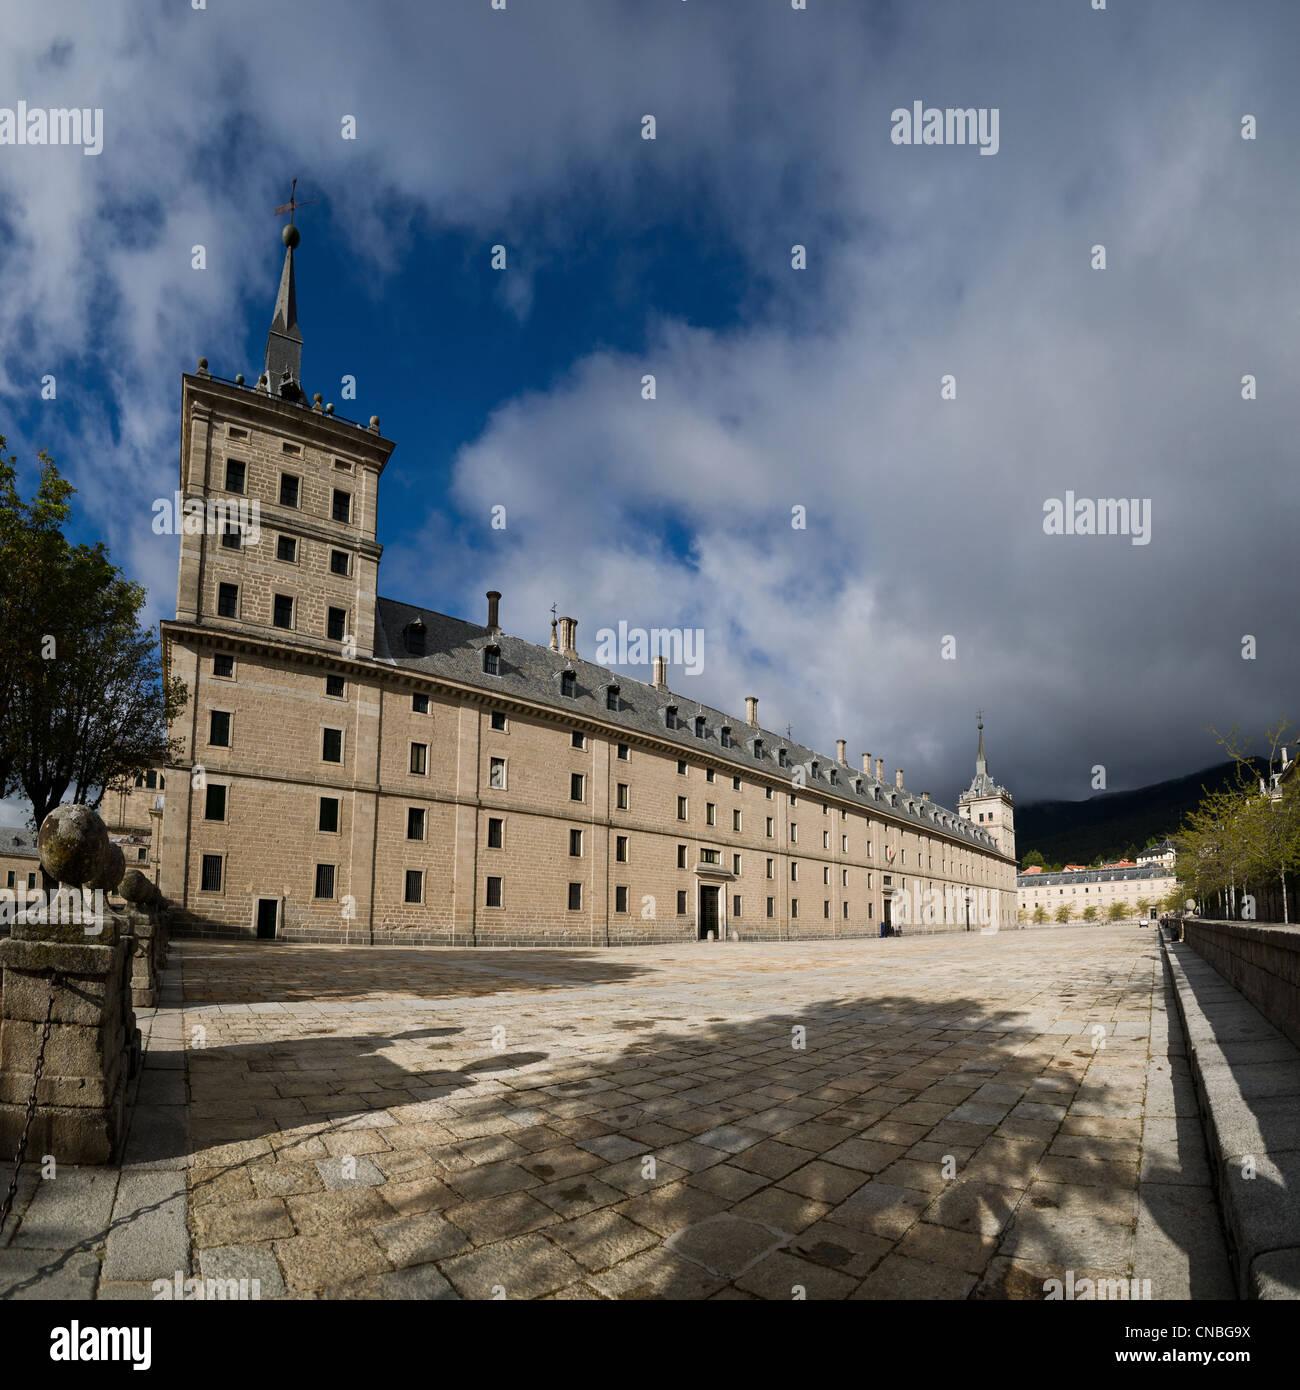 The Royal Seat of San Lorenzo de El Escorial - Stock Image